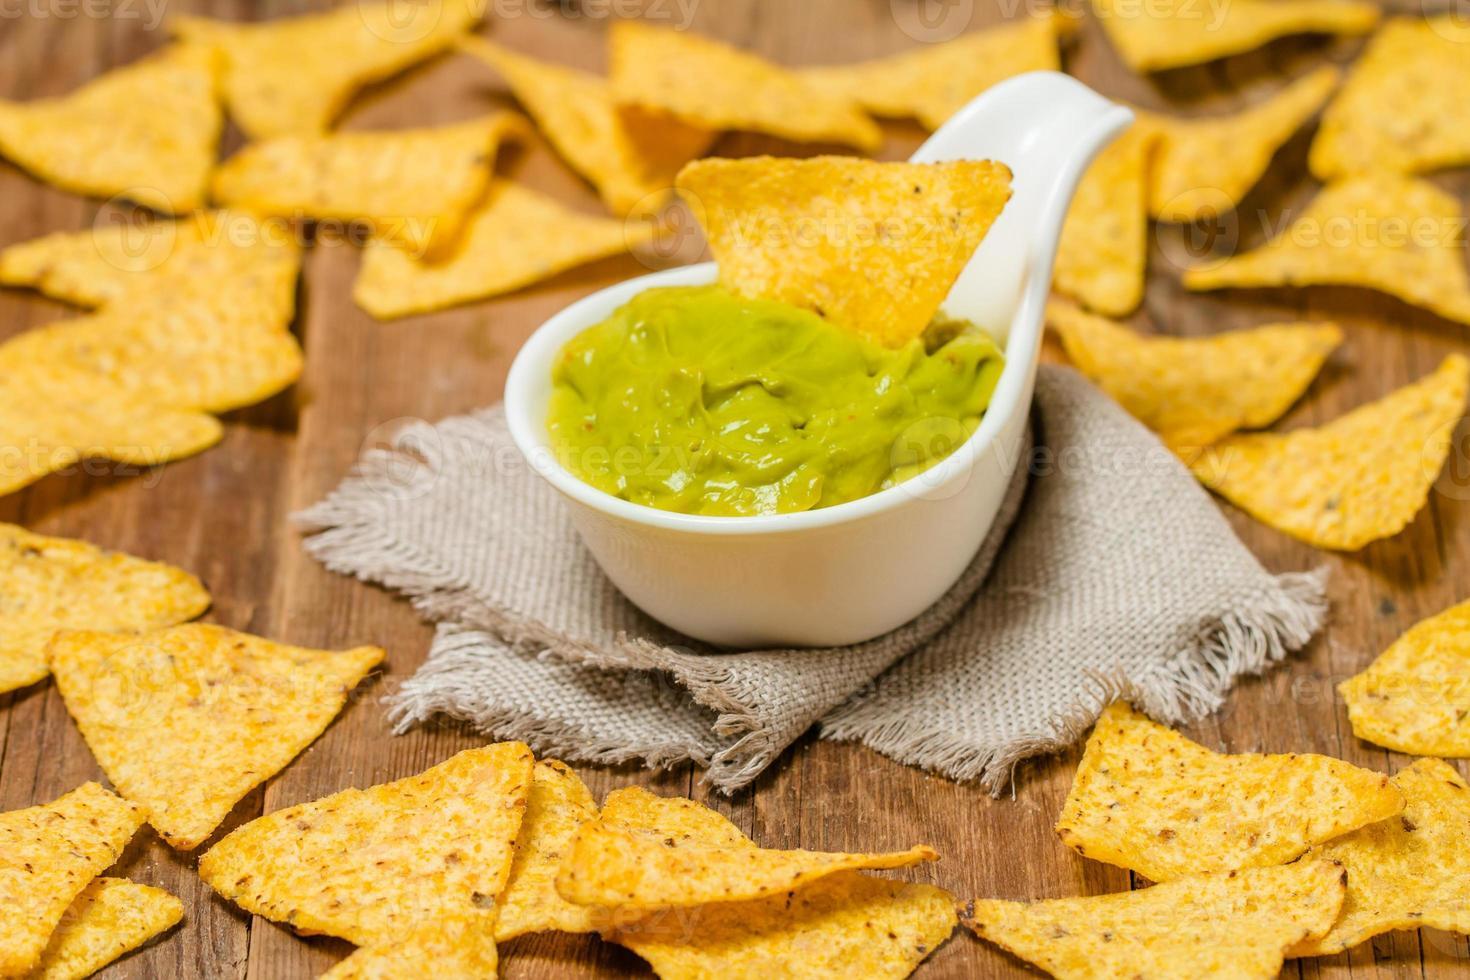 nachos mexicanos com molho guacamole artesanal foto